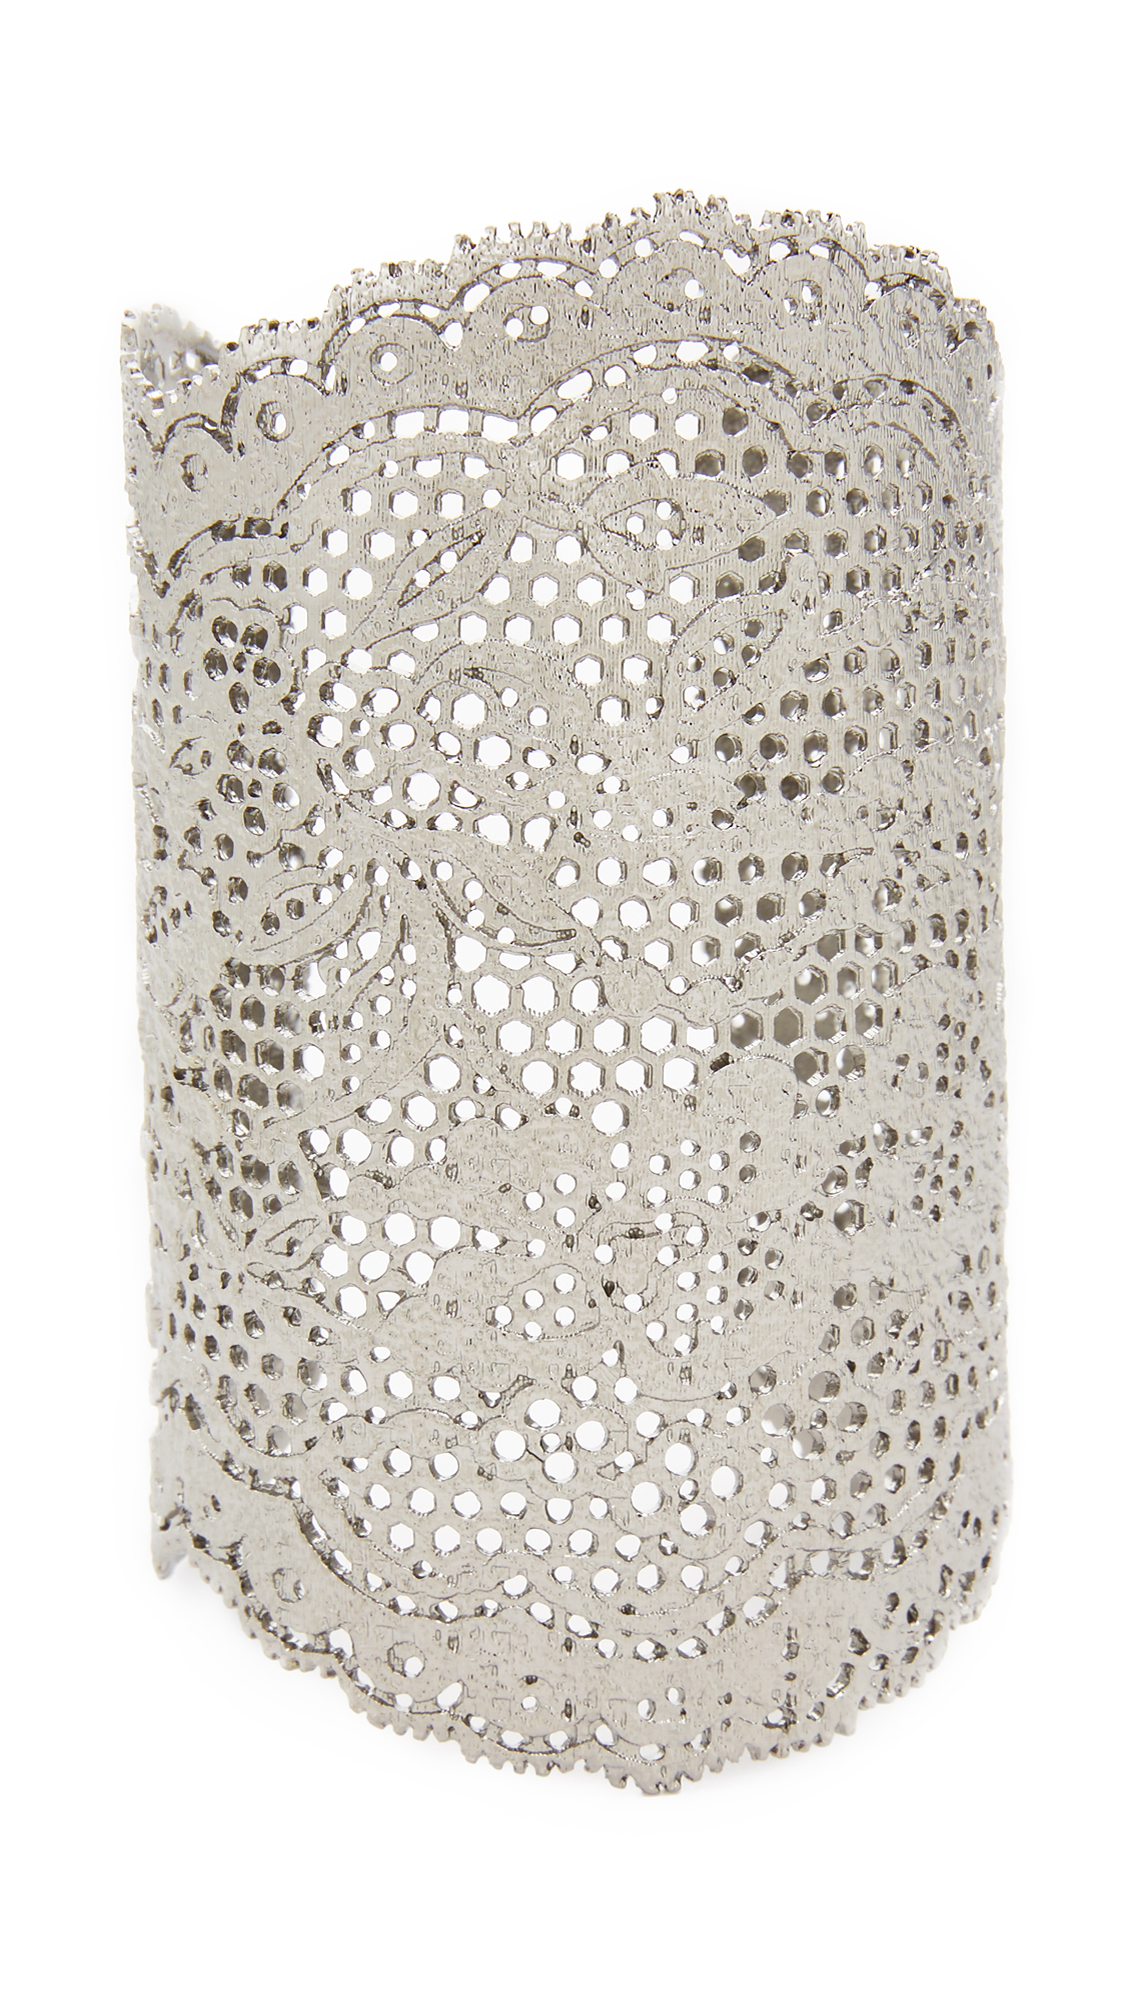 Aurelie Bidermann Vintage Lace Cuff - Black Silver at Shopbop